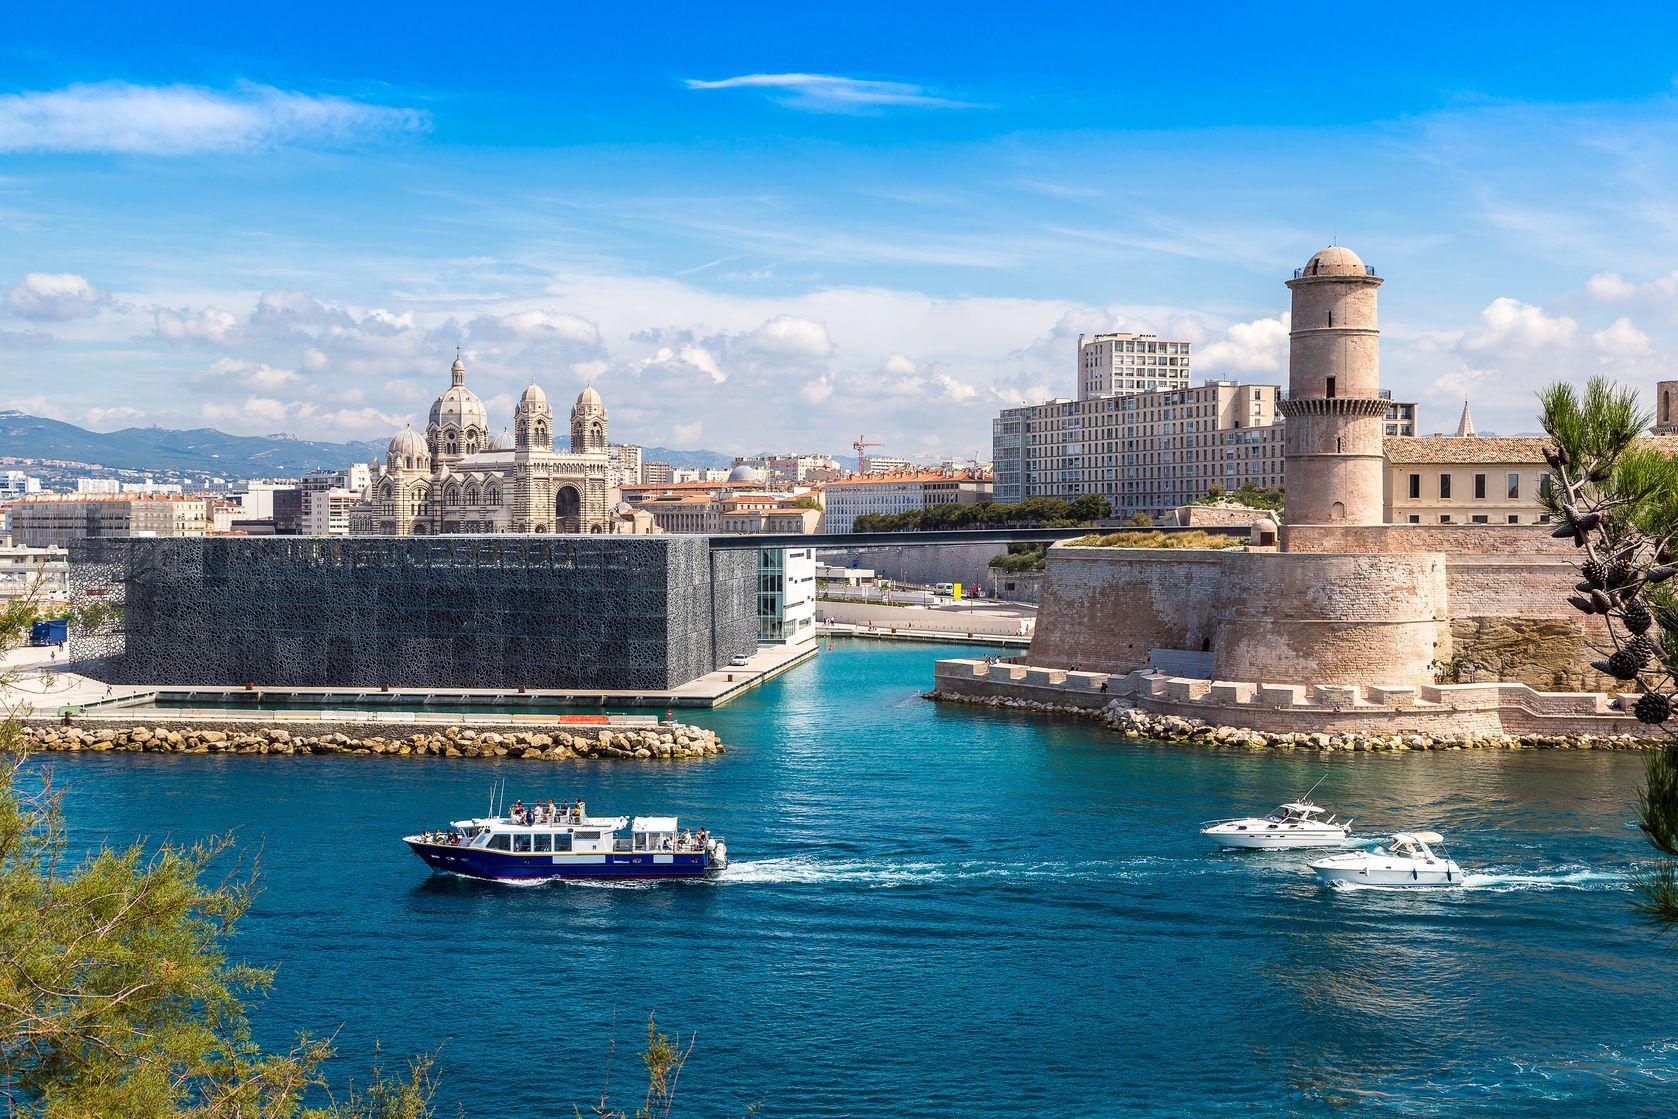 Saint Jean hrad a katedrála de la Major v Marseille | bloodua/123RF.com